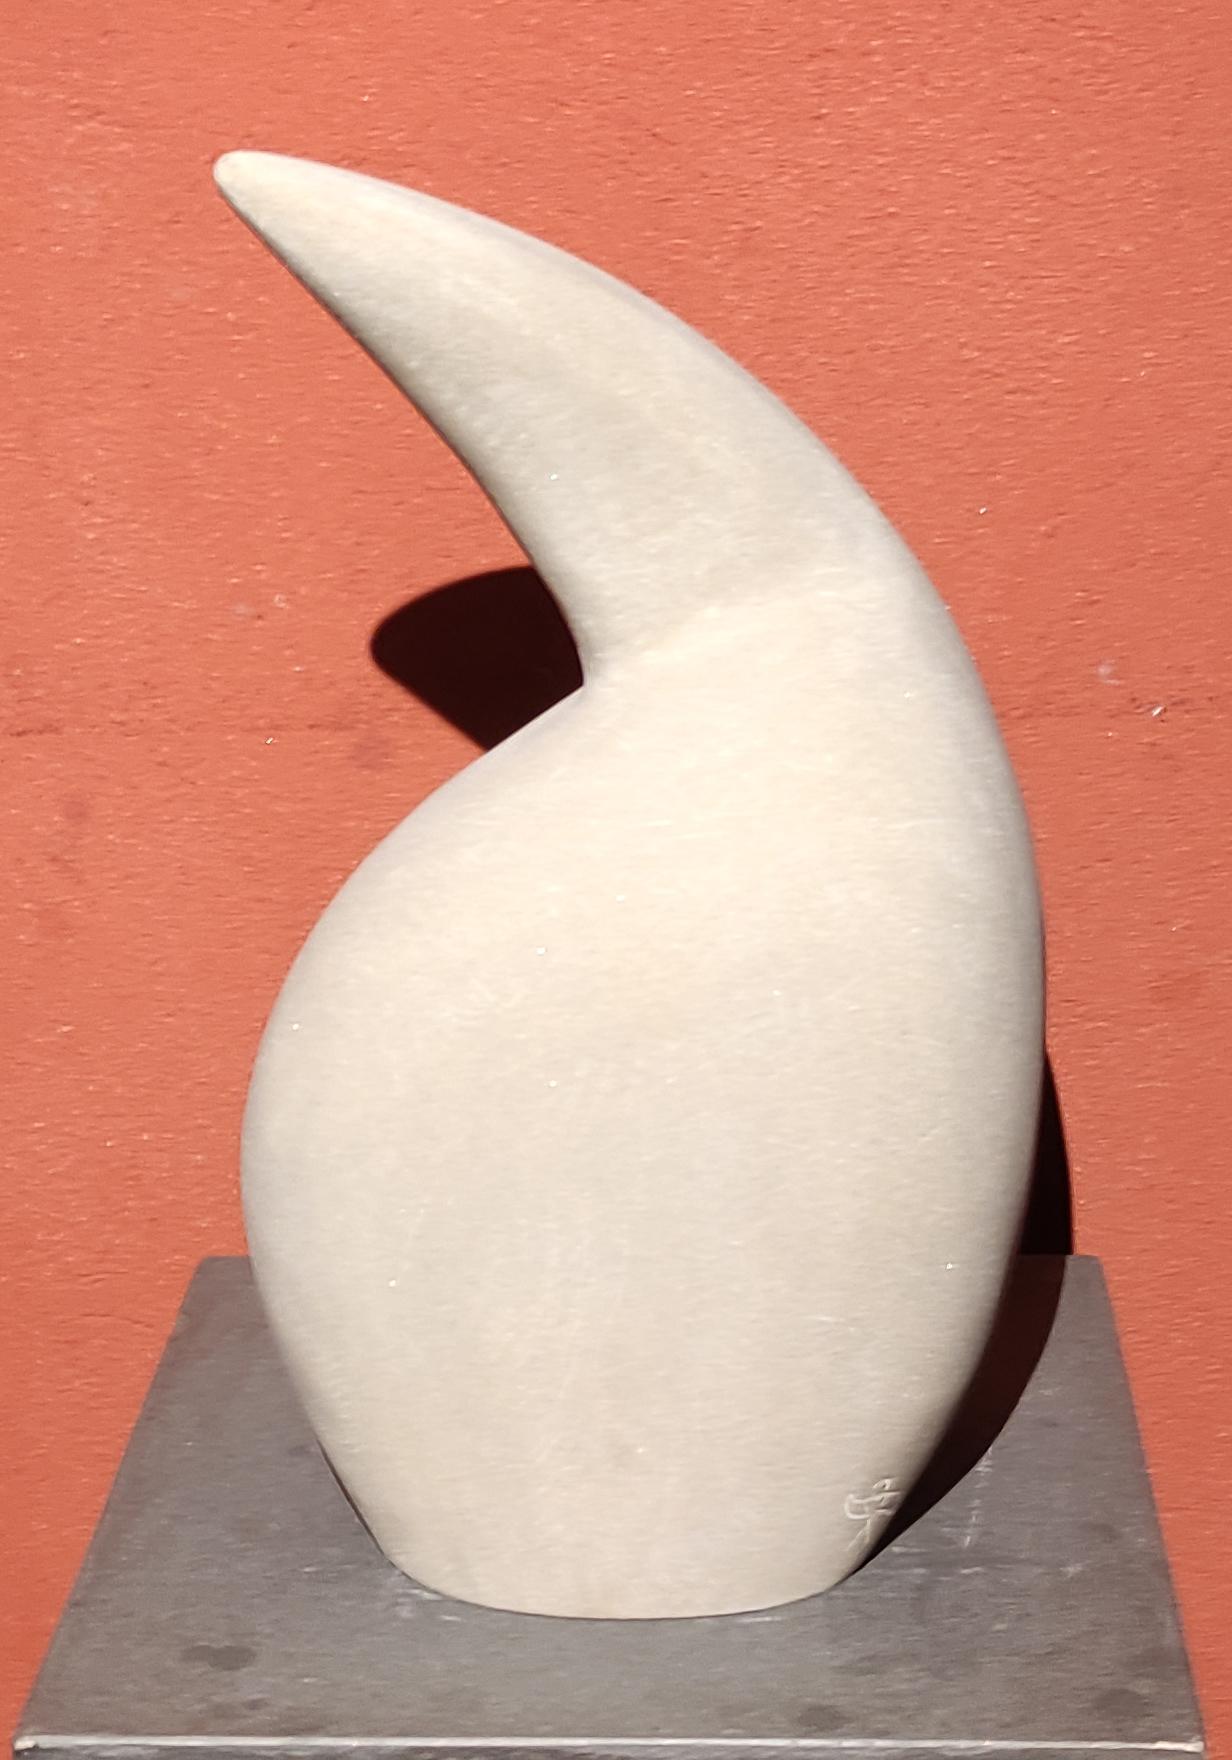 Cristian Terroba  FORMAS FEMENINAS Escultura en piedra arenisca. 38 x 21 cm. 2012